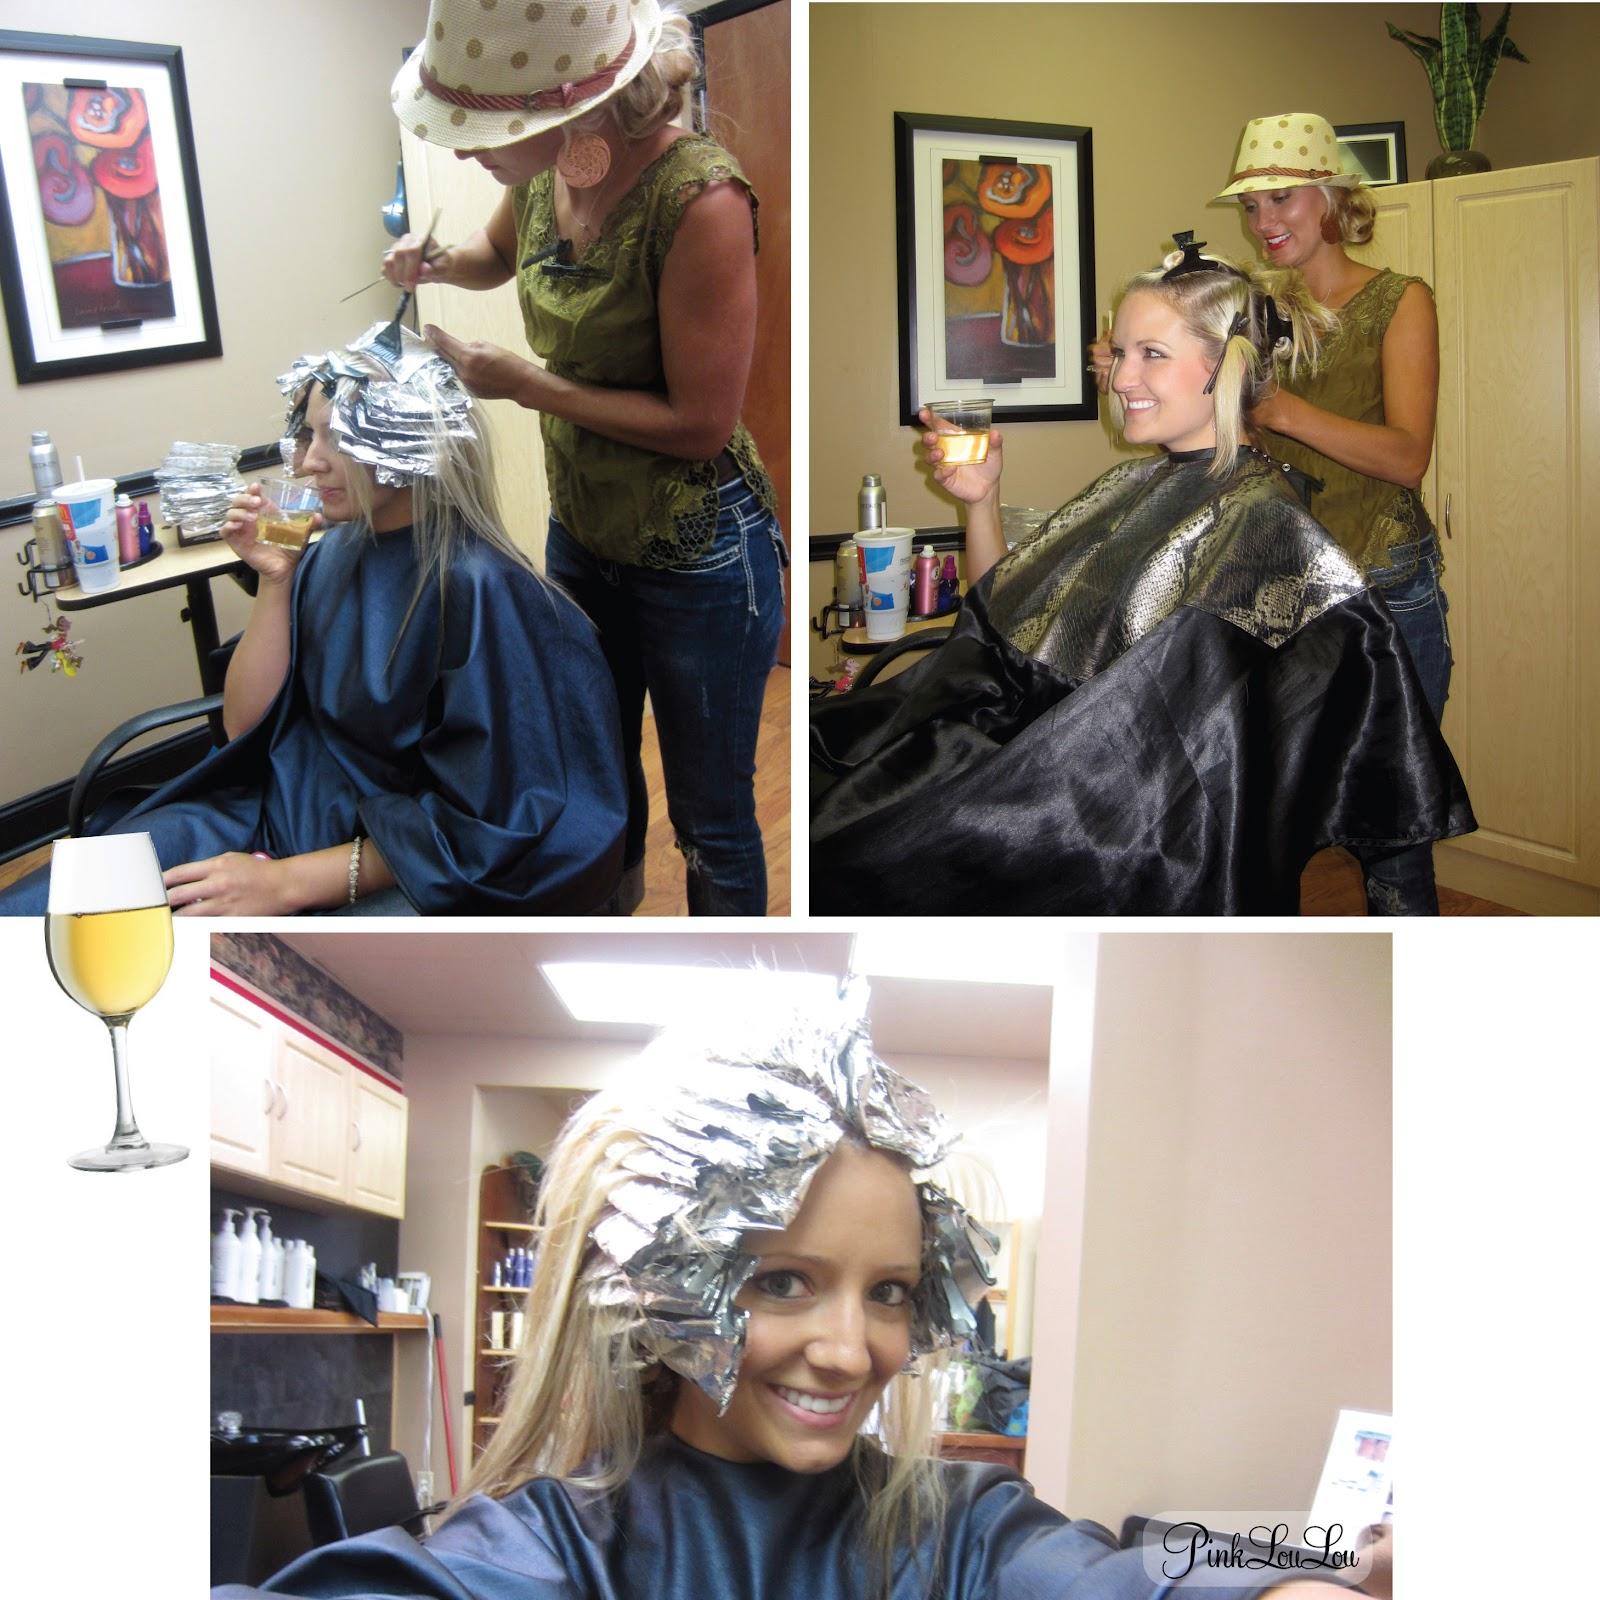 blonde mistress hair salon bondage